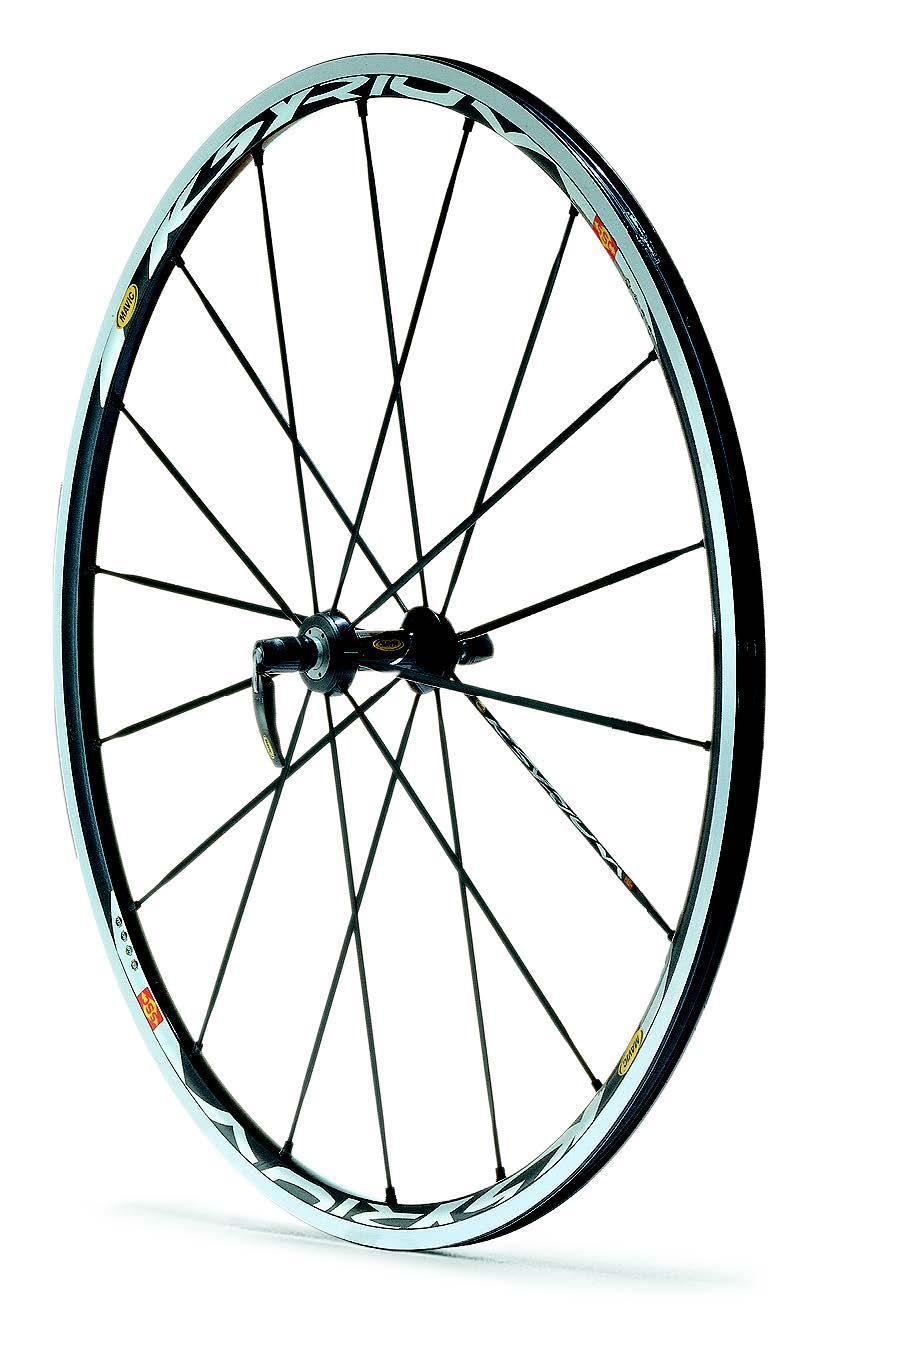 32317dcedf0 How Mavic's Ksyrium wheelset changed everything. 1999_MAVIC_Ksyrium.jpg